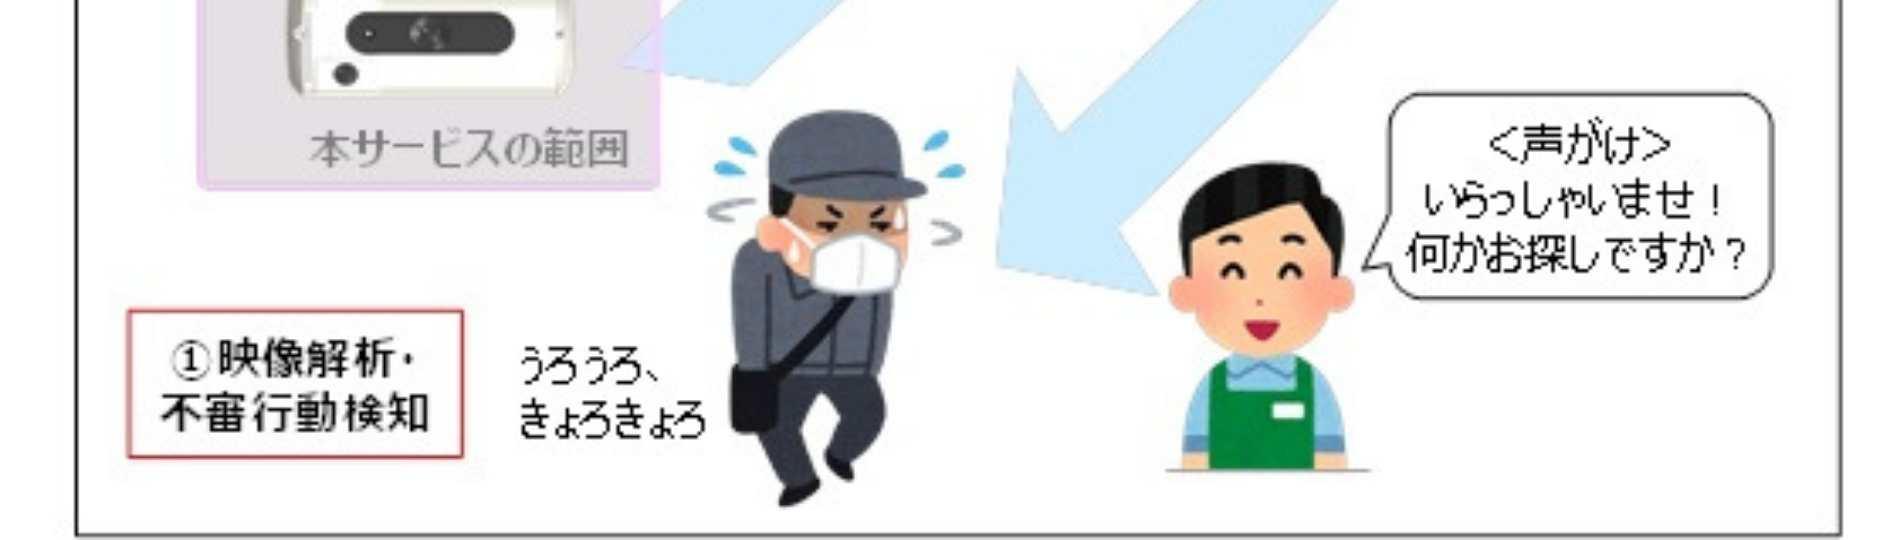 Japanese surveillance